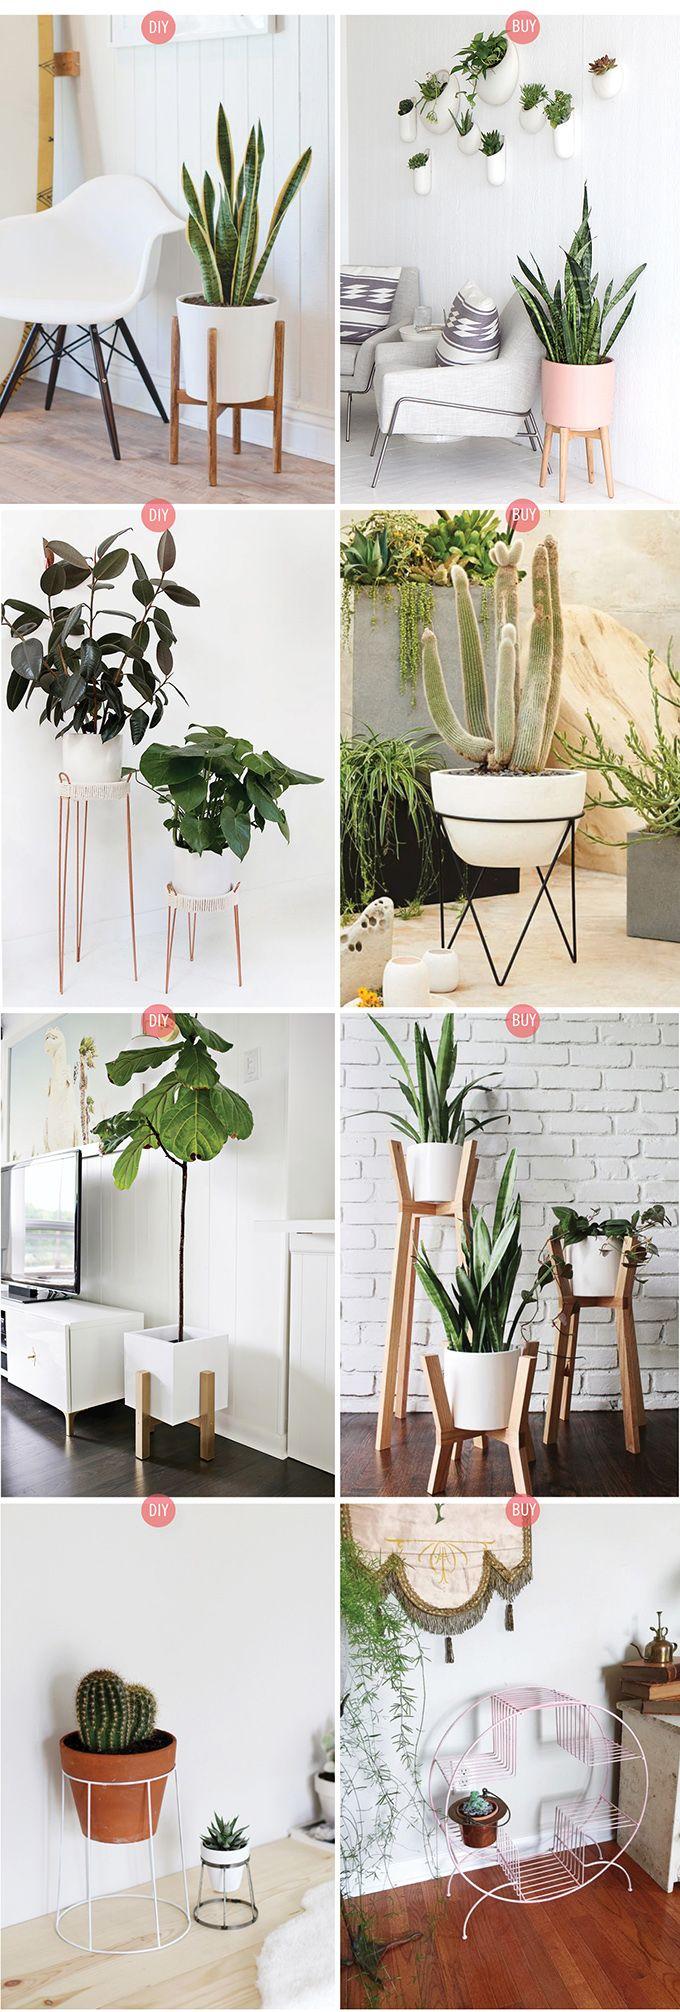 DIY or BUY Diy plant stand, Diy planter box, Plant decor